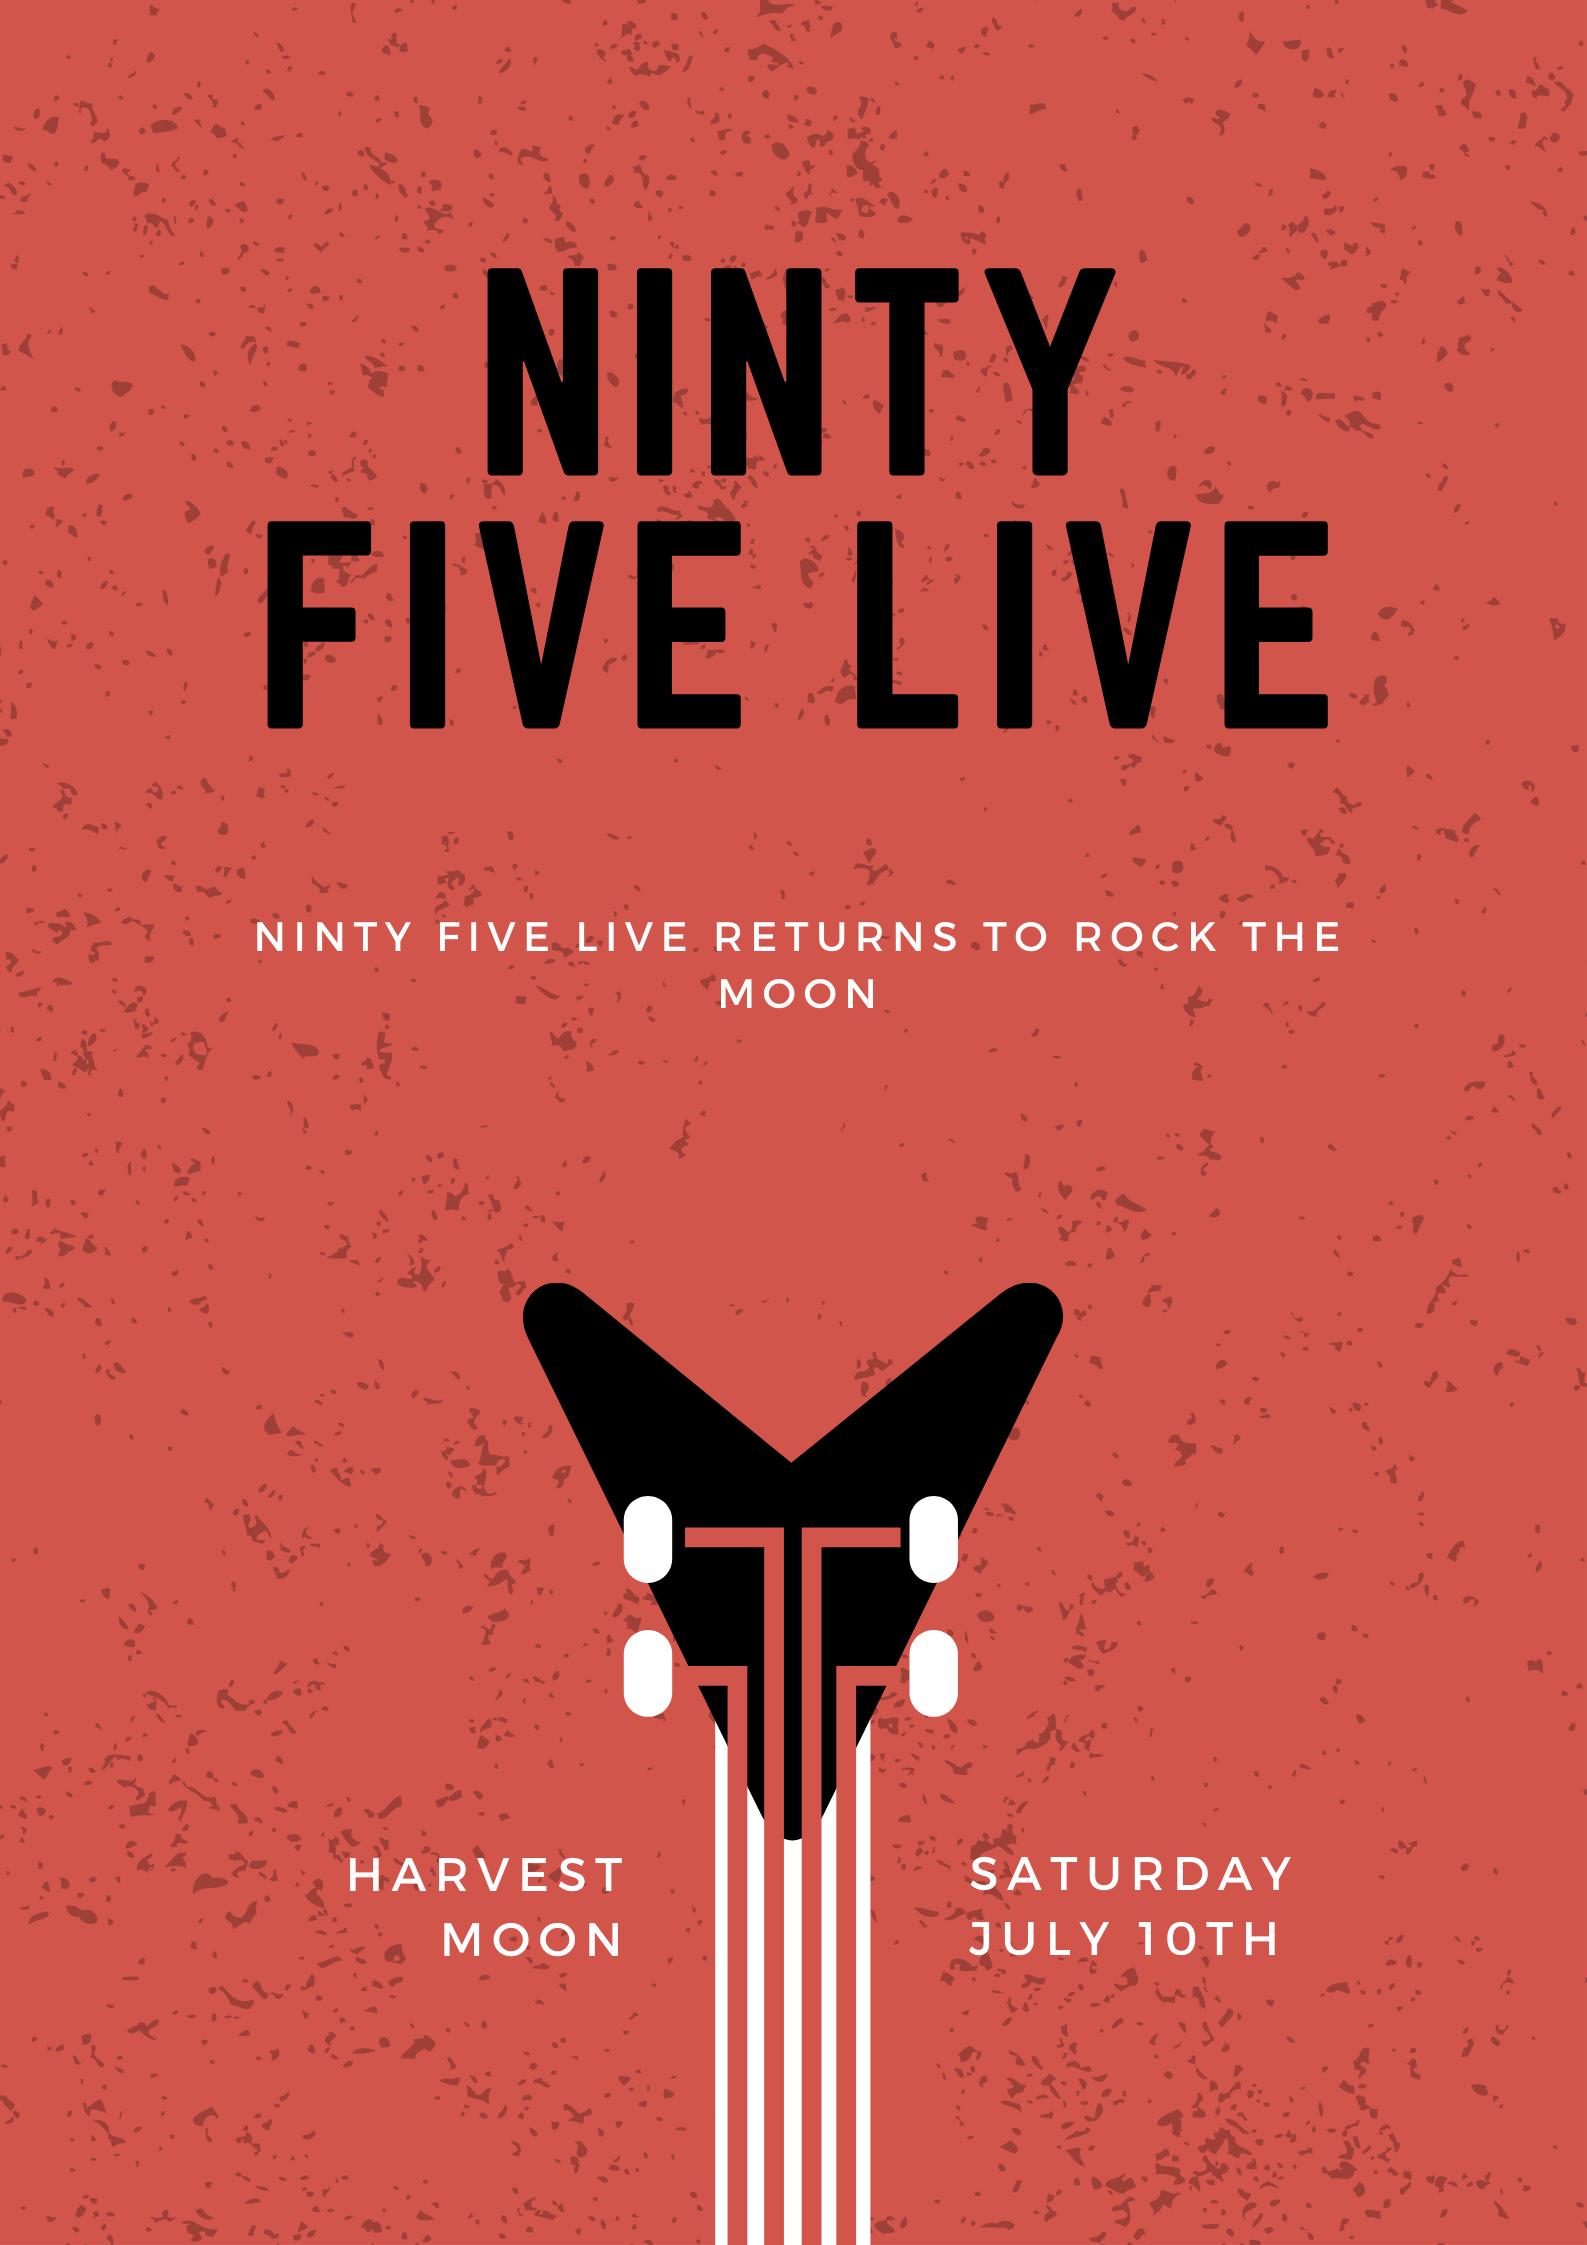 Ninty Five Live